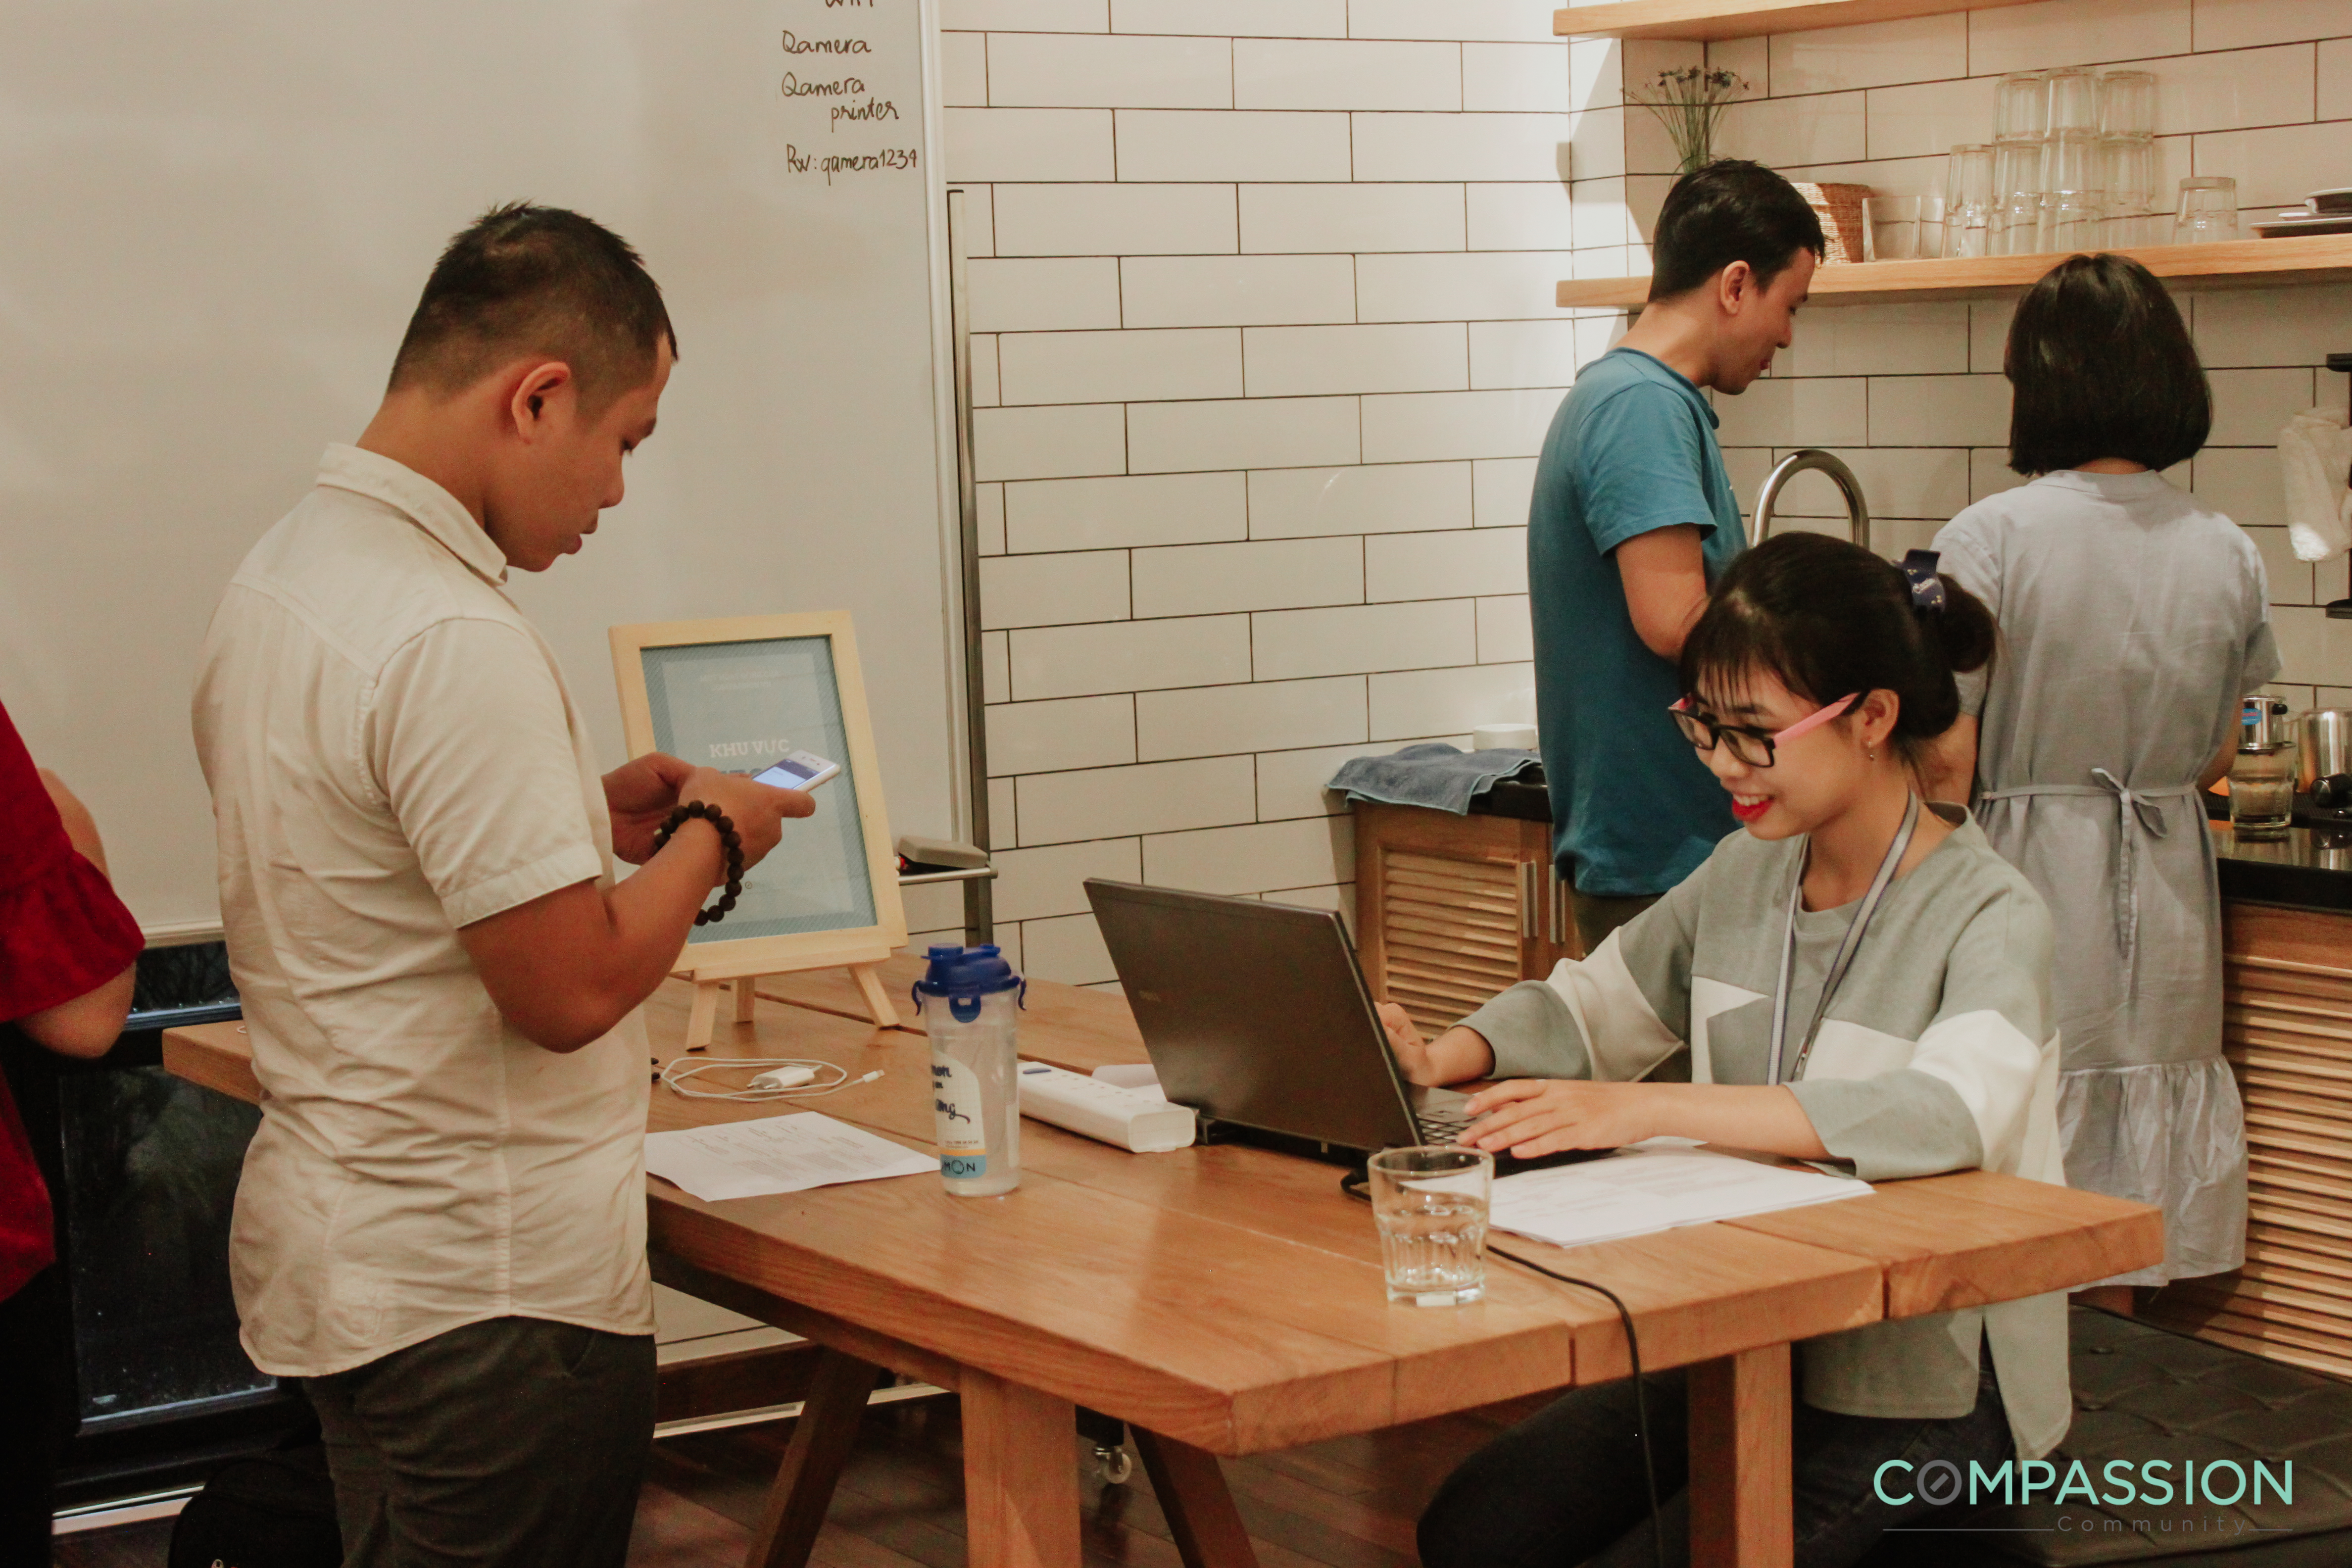 Compassion Hub tại Qspace